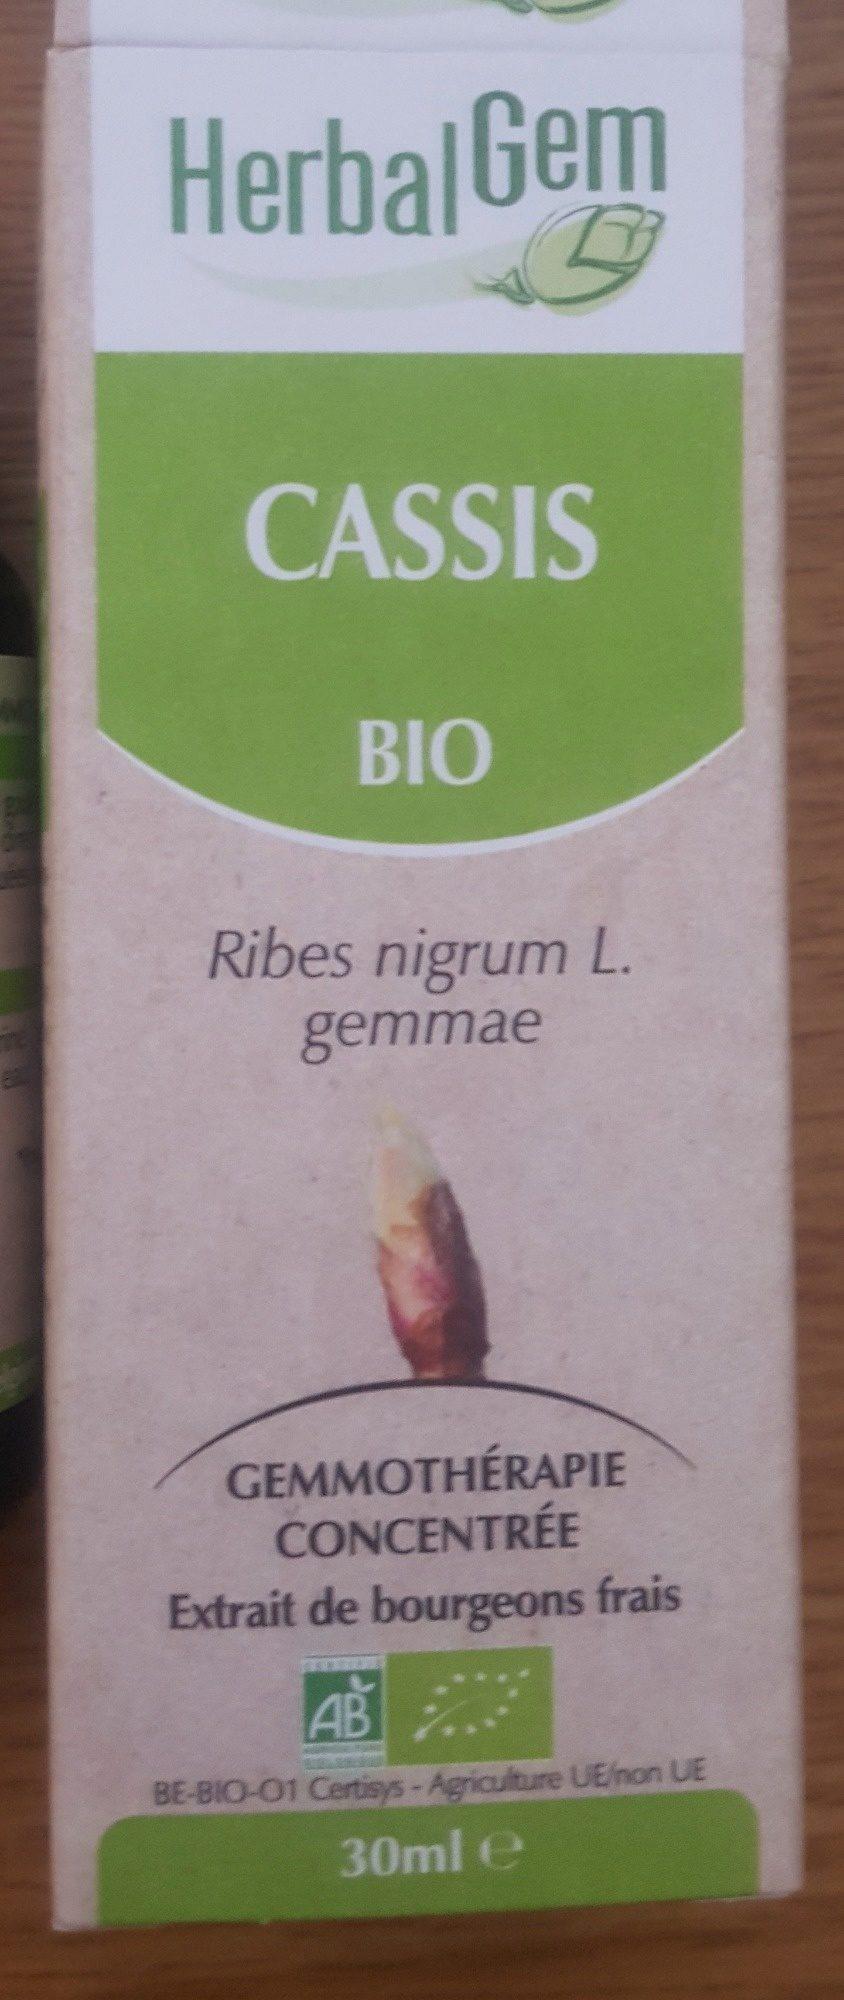 Cassis Bourgeons Macerat Bio Herbalgelm - Produit